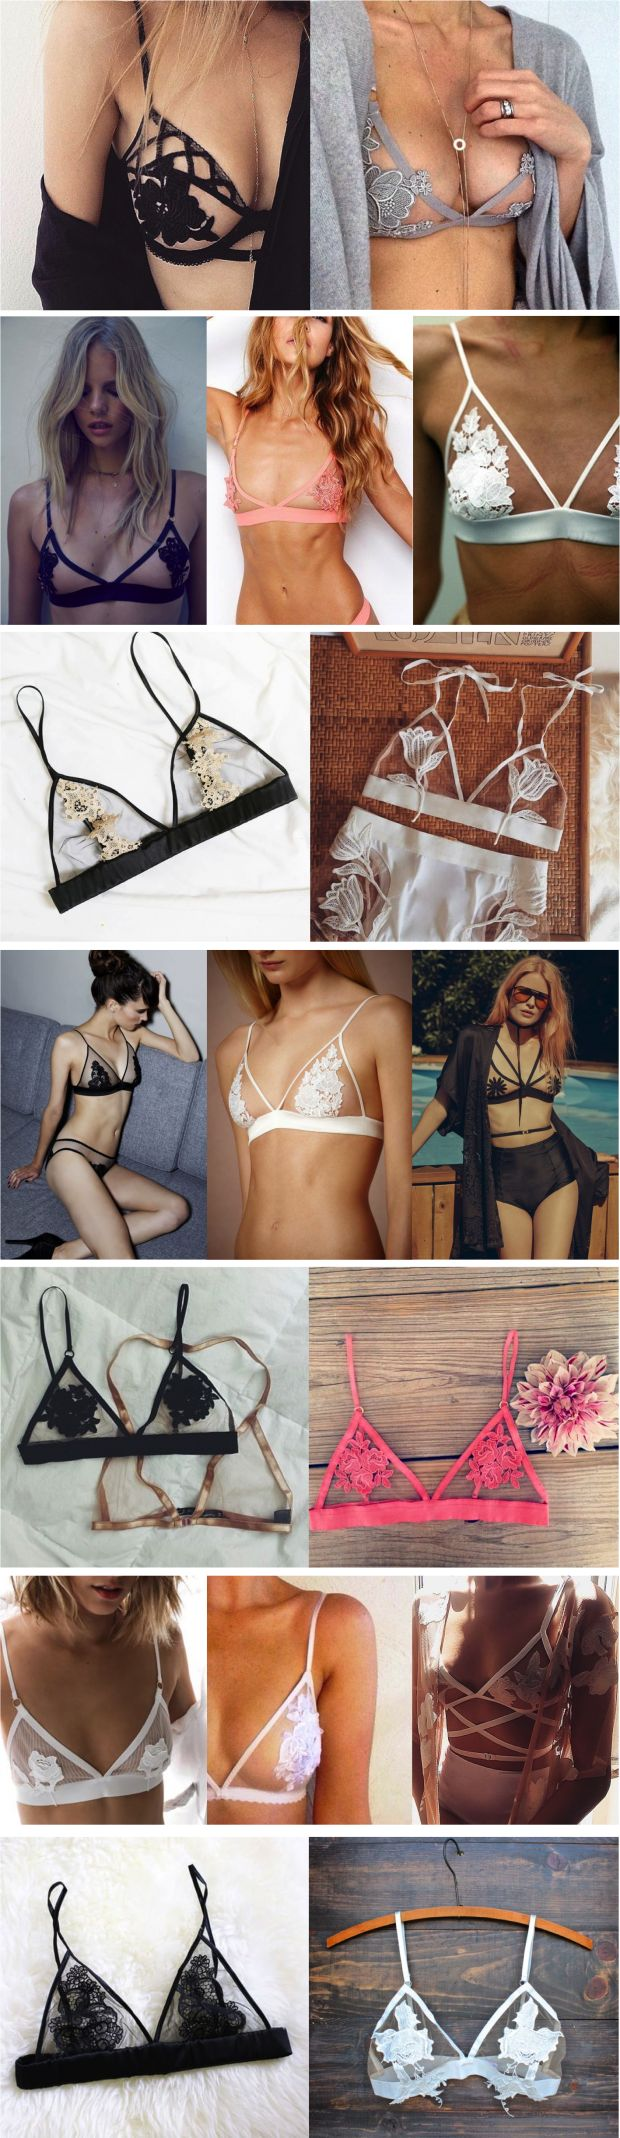 http://dingox.com TREND ALERT: LINGERIE - Fashionismo